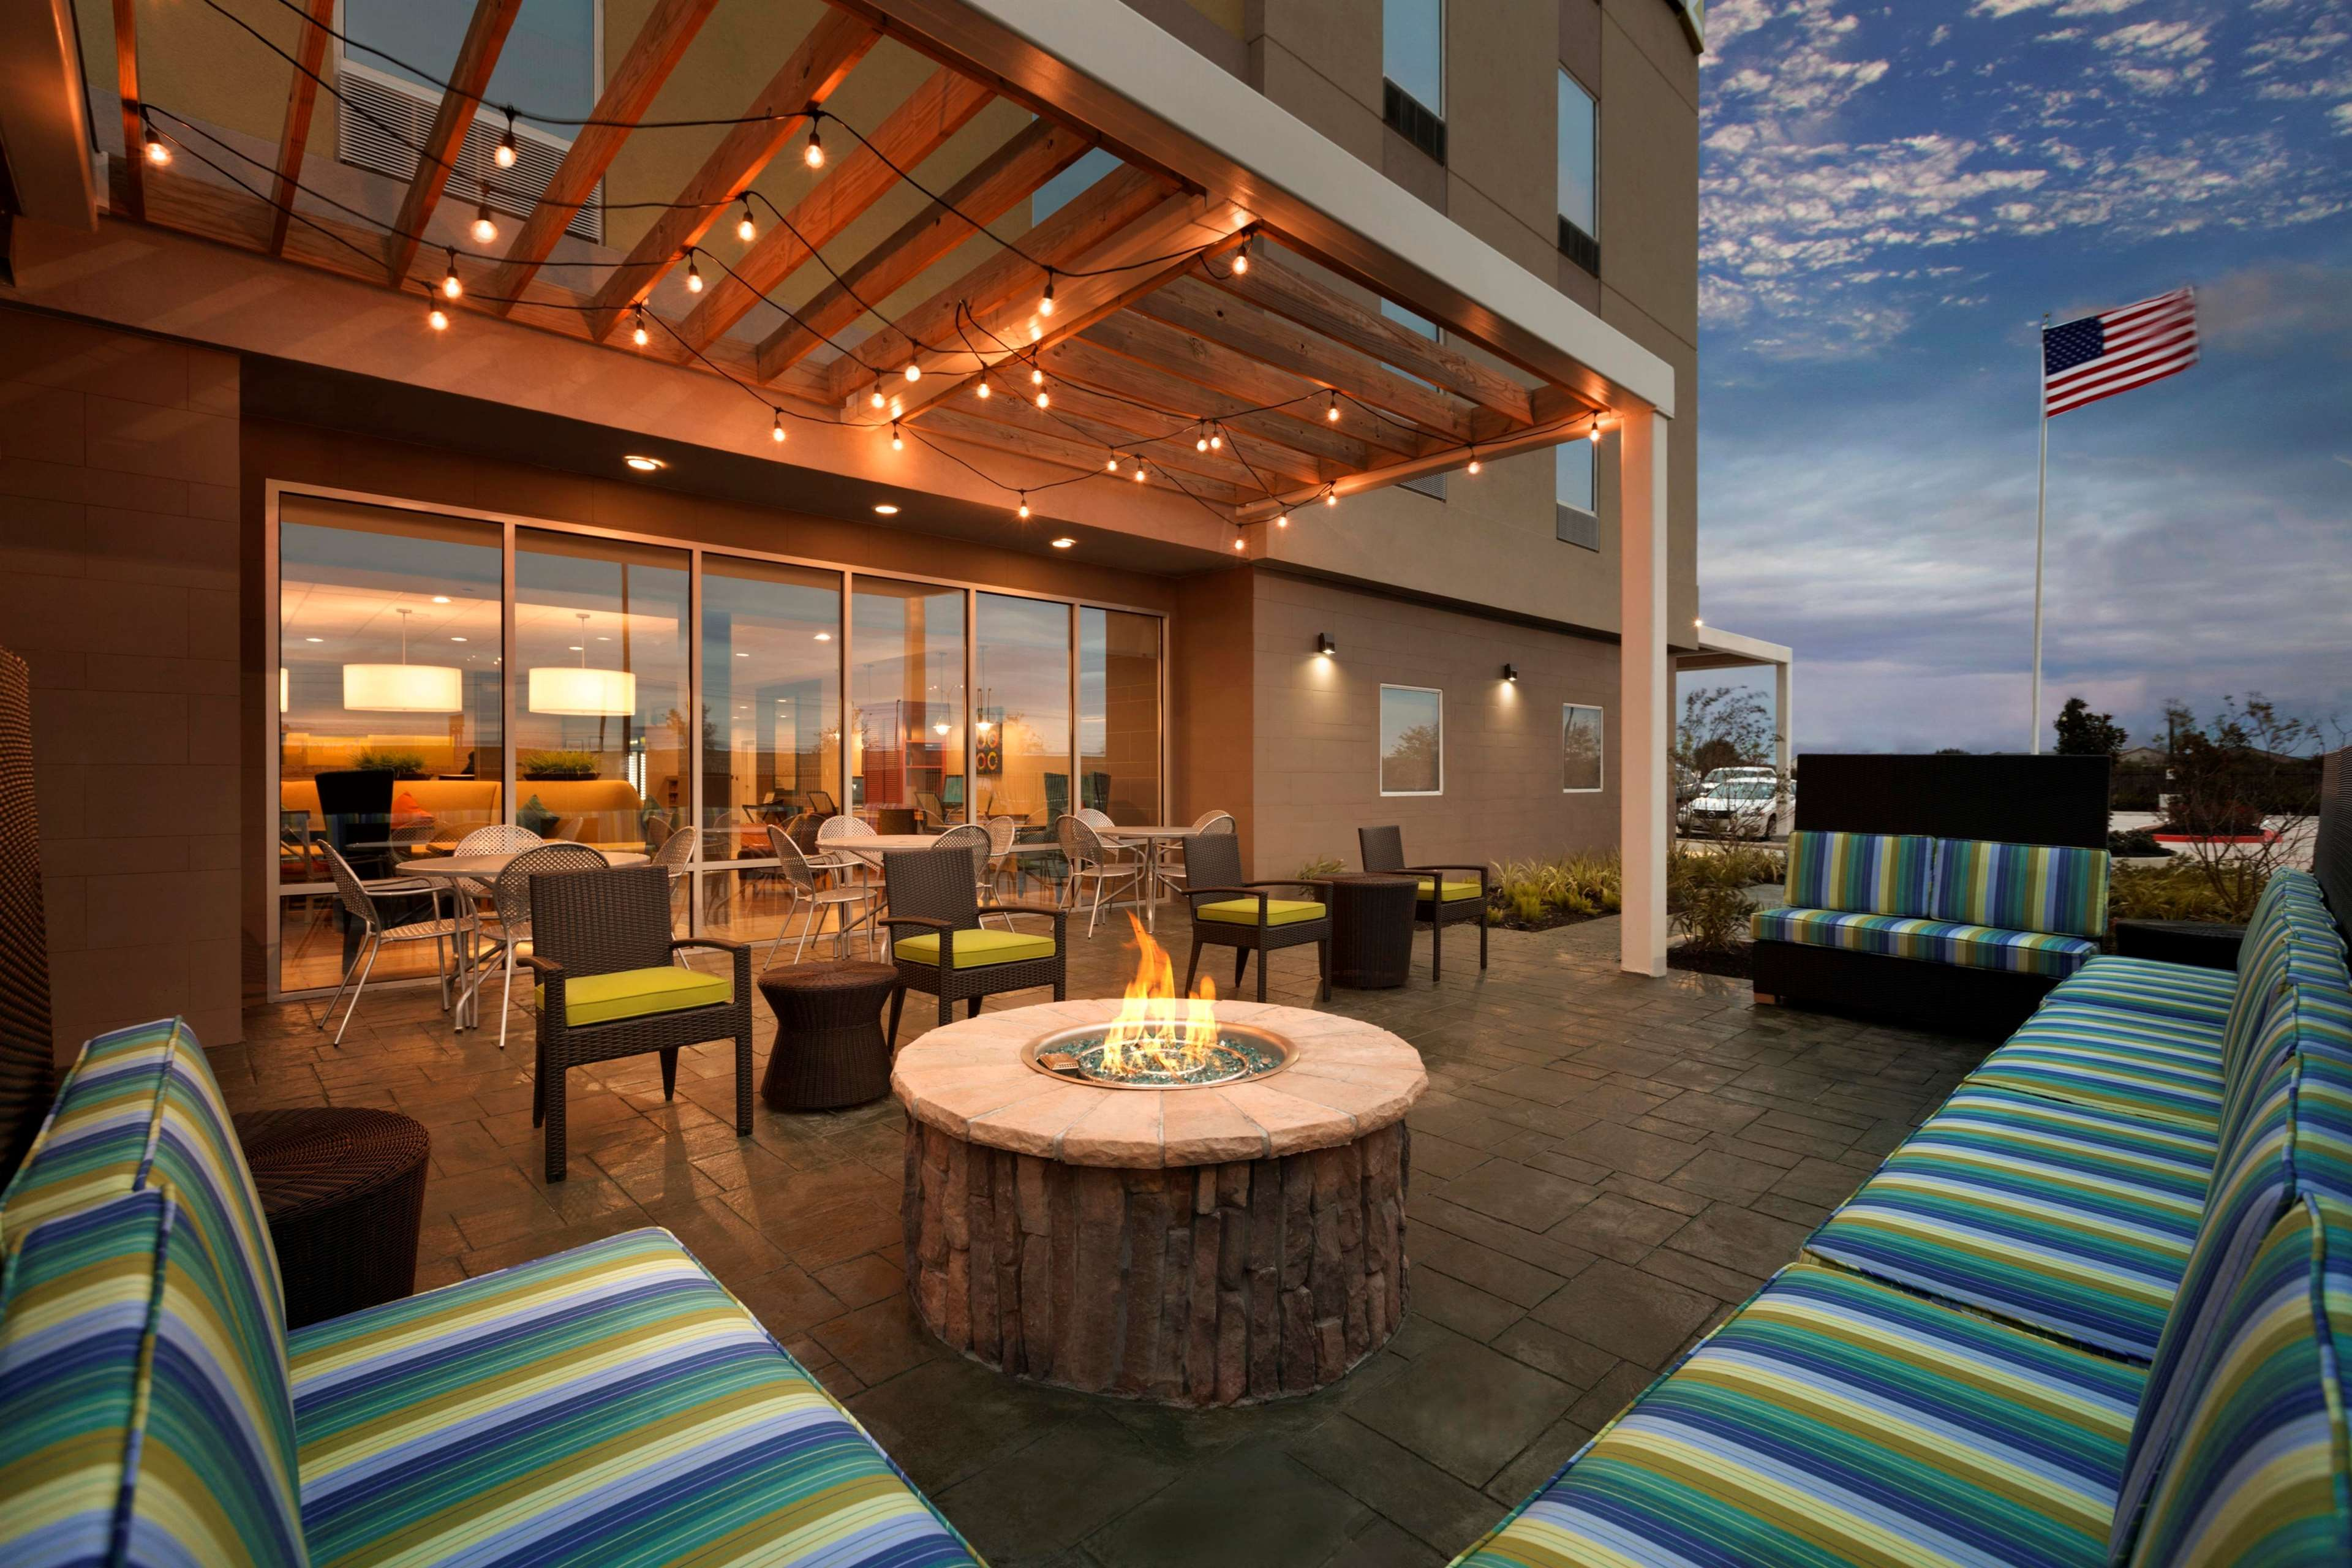 Home2 Suites by Hilton Houston Pasadena image 18